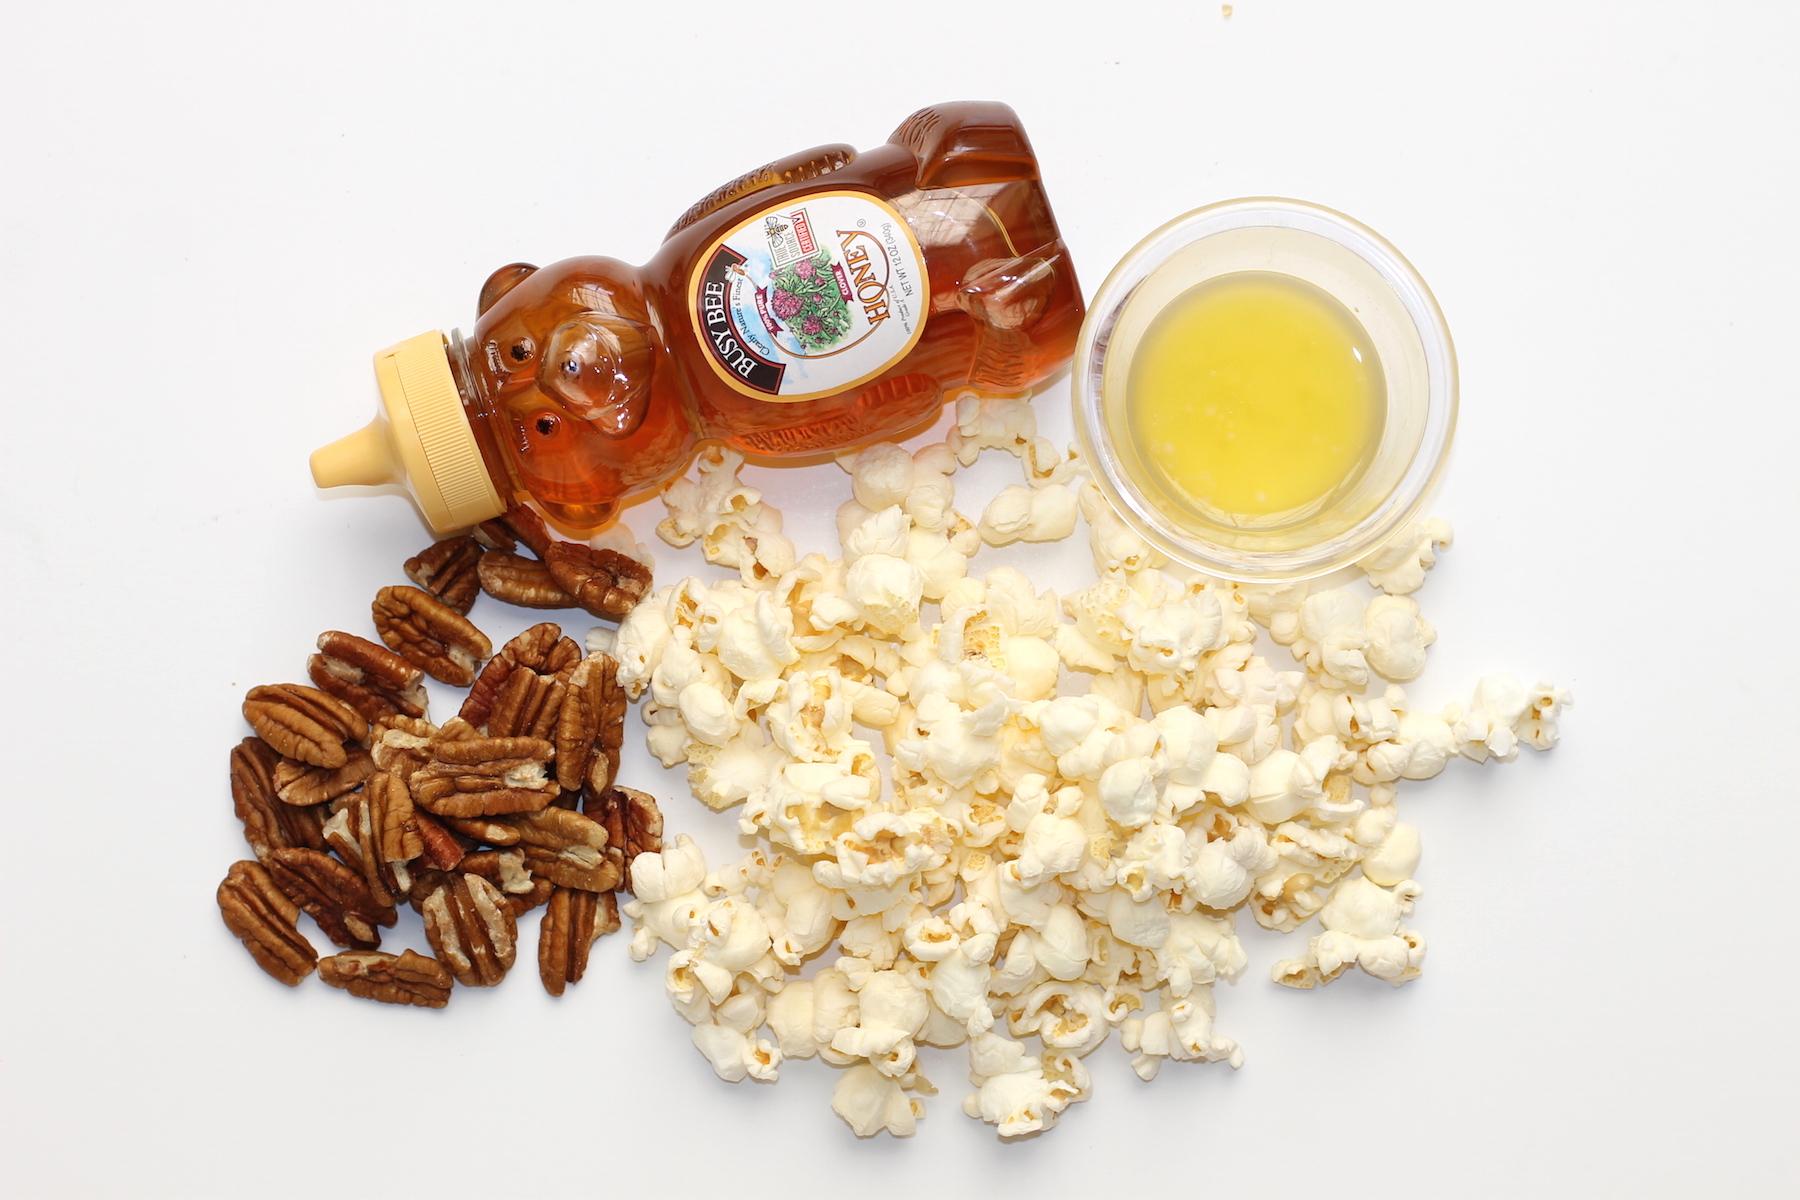 2-ingredientsfathers-day-popcorn-recipes-handmadebykelly.com-onlinelabels.com_